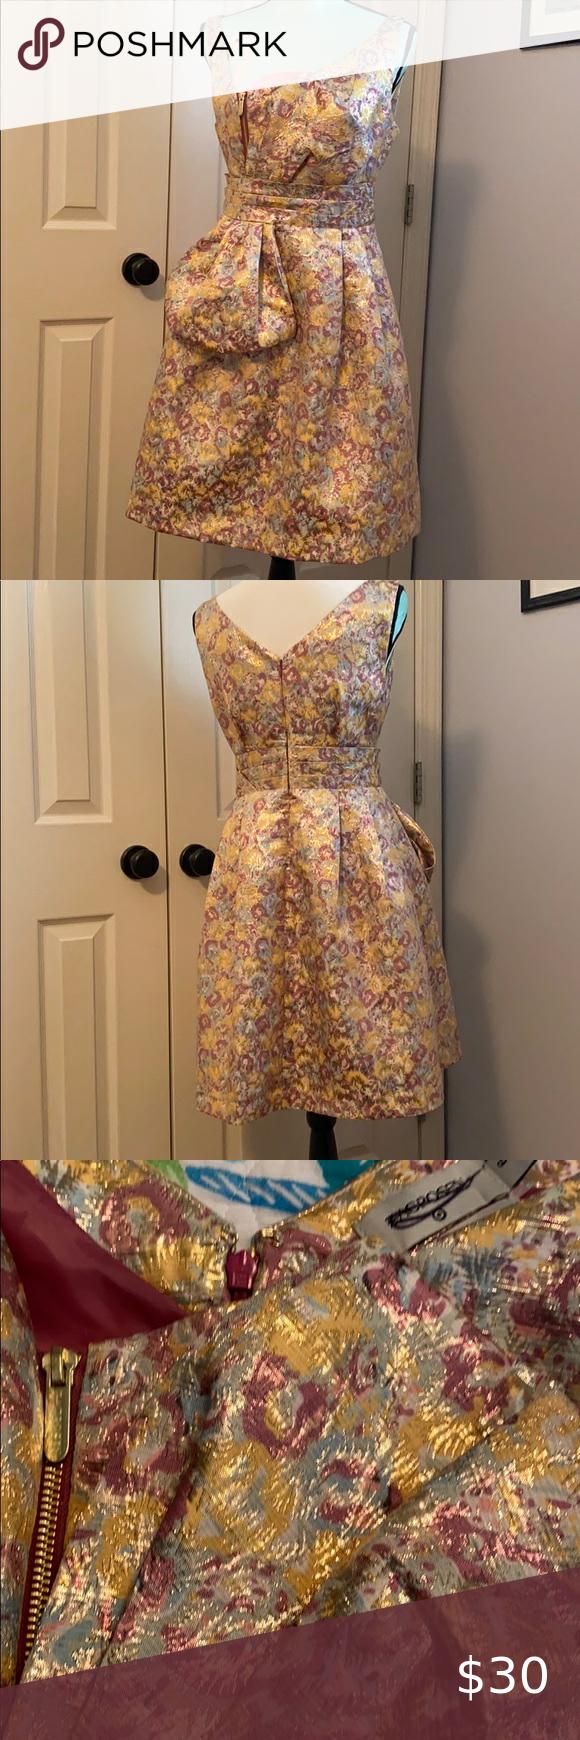 Nwt Zac Posen Formal Dress Target Dresses Colorful Dresses Formal Dresses [ 1740 x 580 Pixel ]